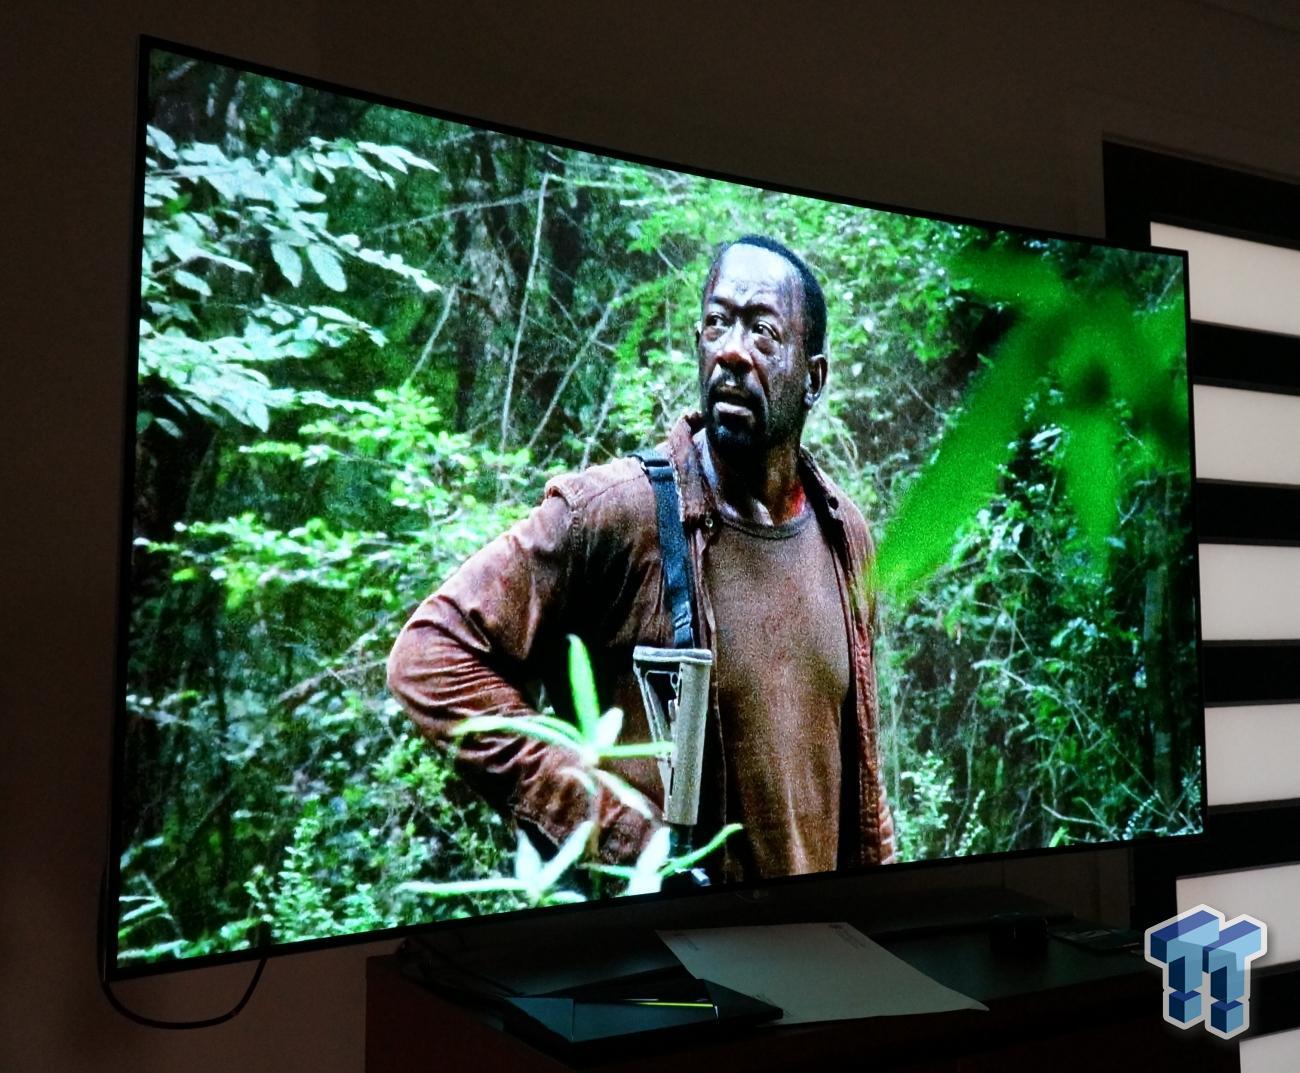 LG 65EG9600 65-inch 4K Curved OLED Ultra HD TV Experience